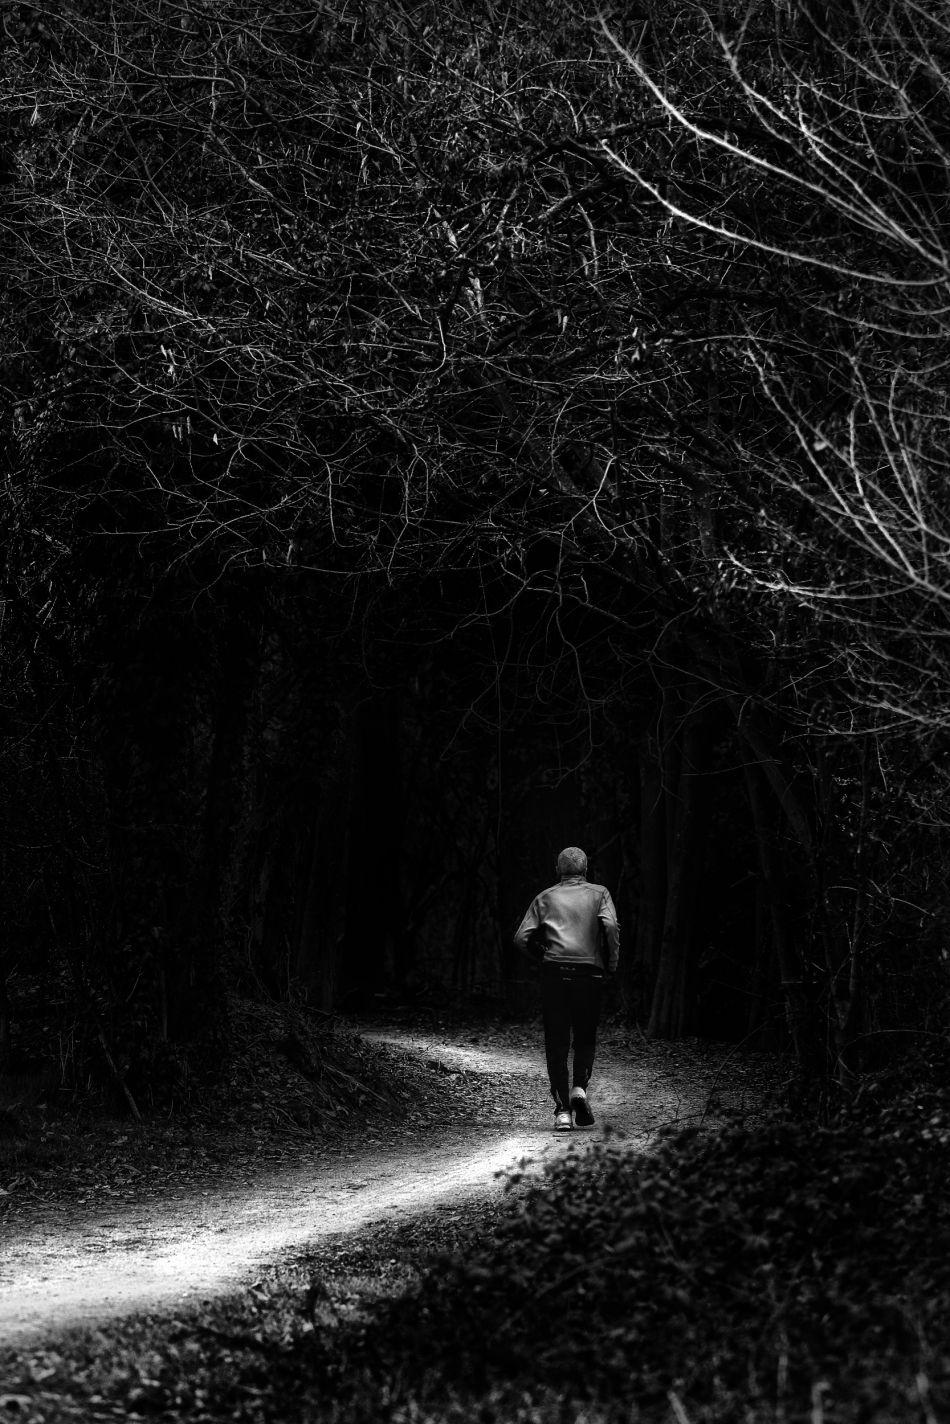 La selva oscura | Photoblog | Life Beyond Tourism